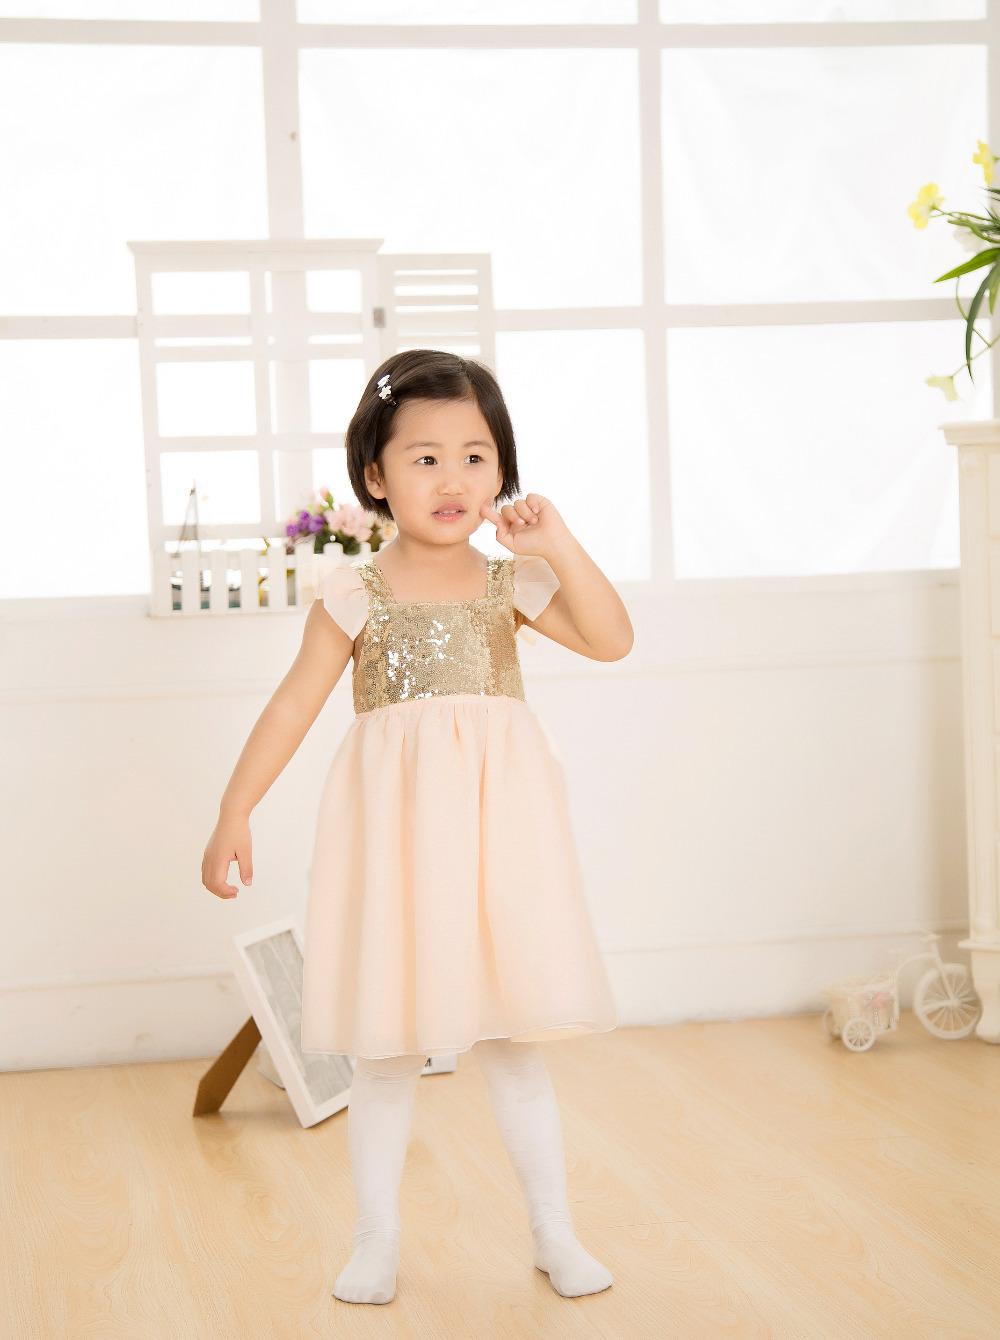 2015 new feshion cotton baby girls dress sparkle princess dresses tutu dress party cloth dress kp-spds08-13<br><br>Aliexpress